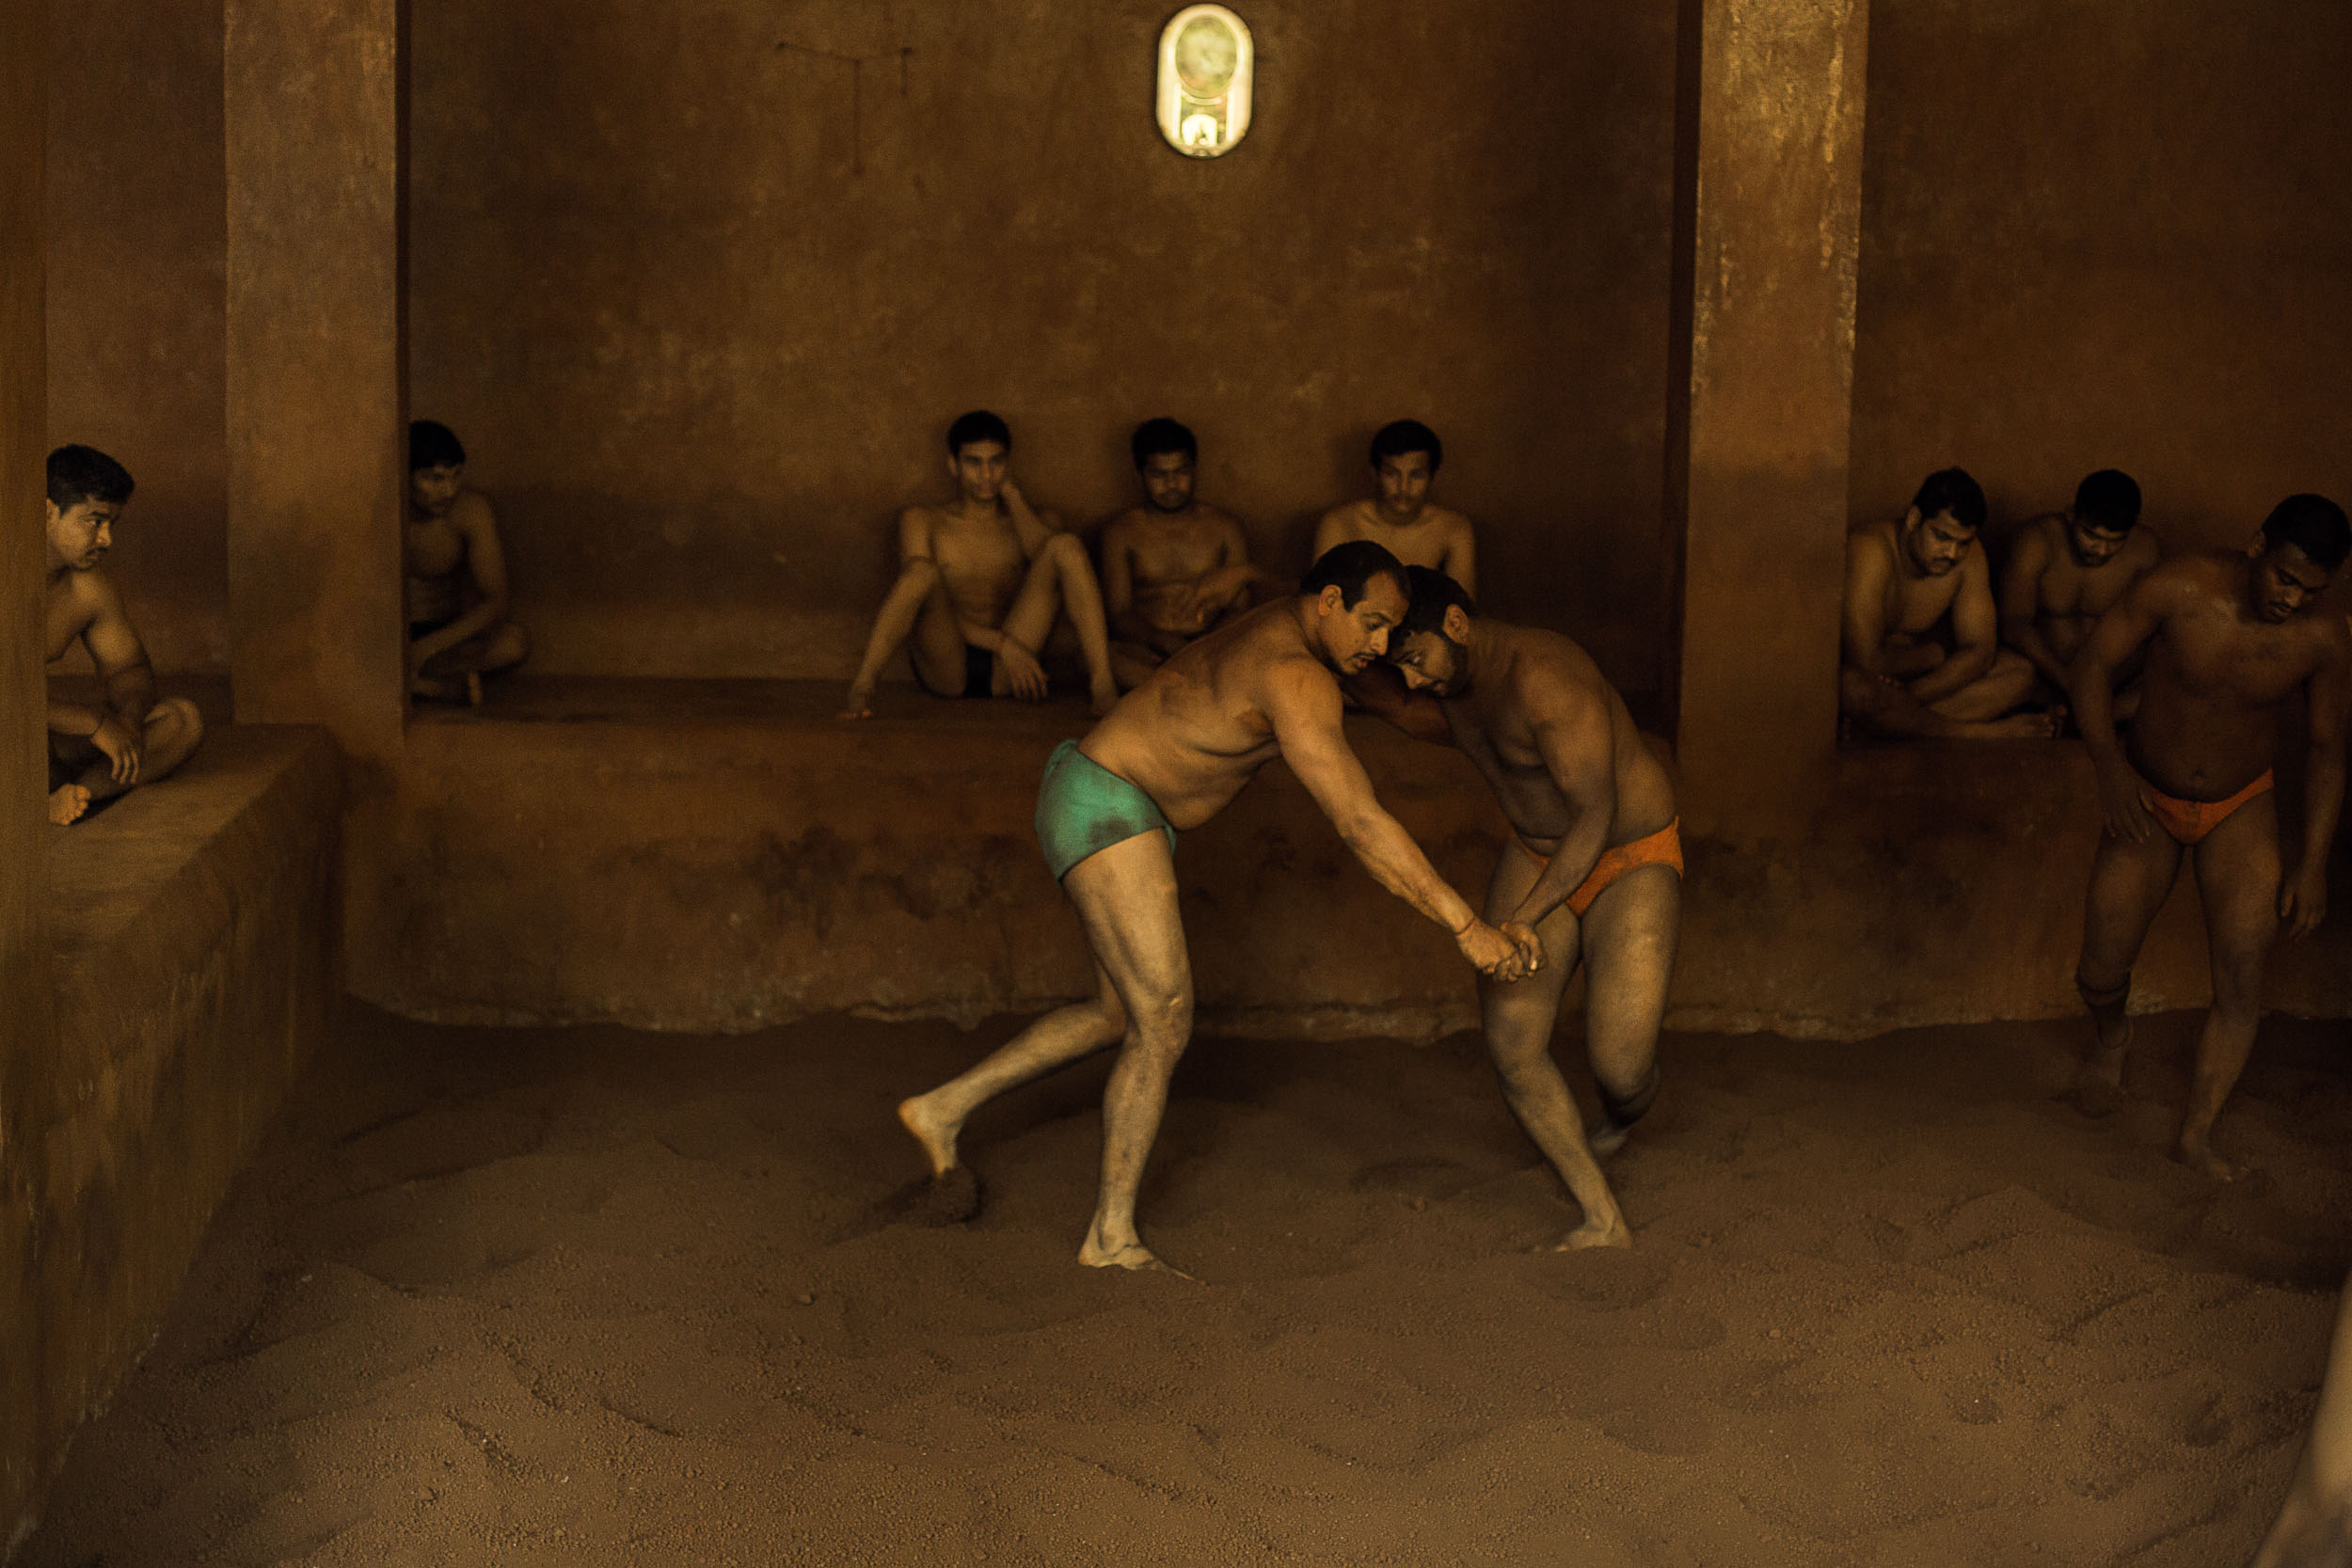 Sindhur_Photography_Travel_People_Wrestlers-19.JPG